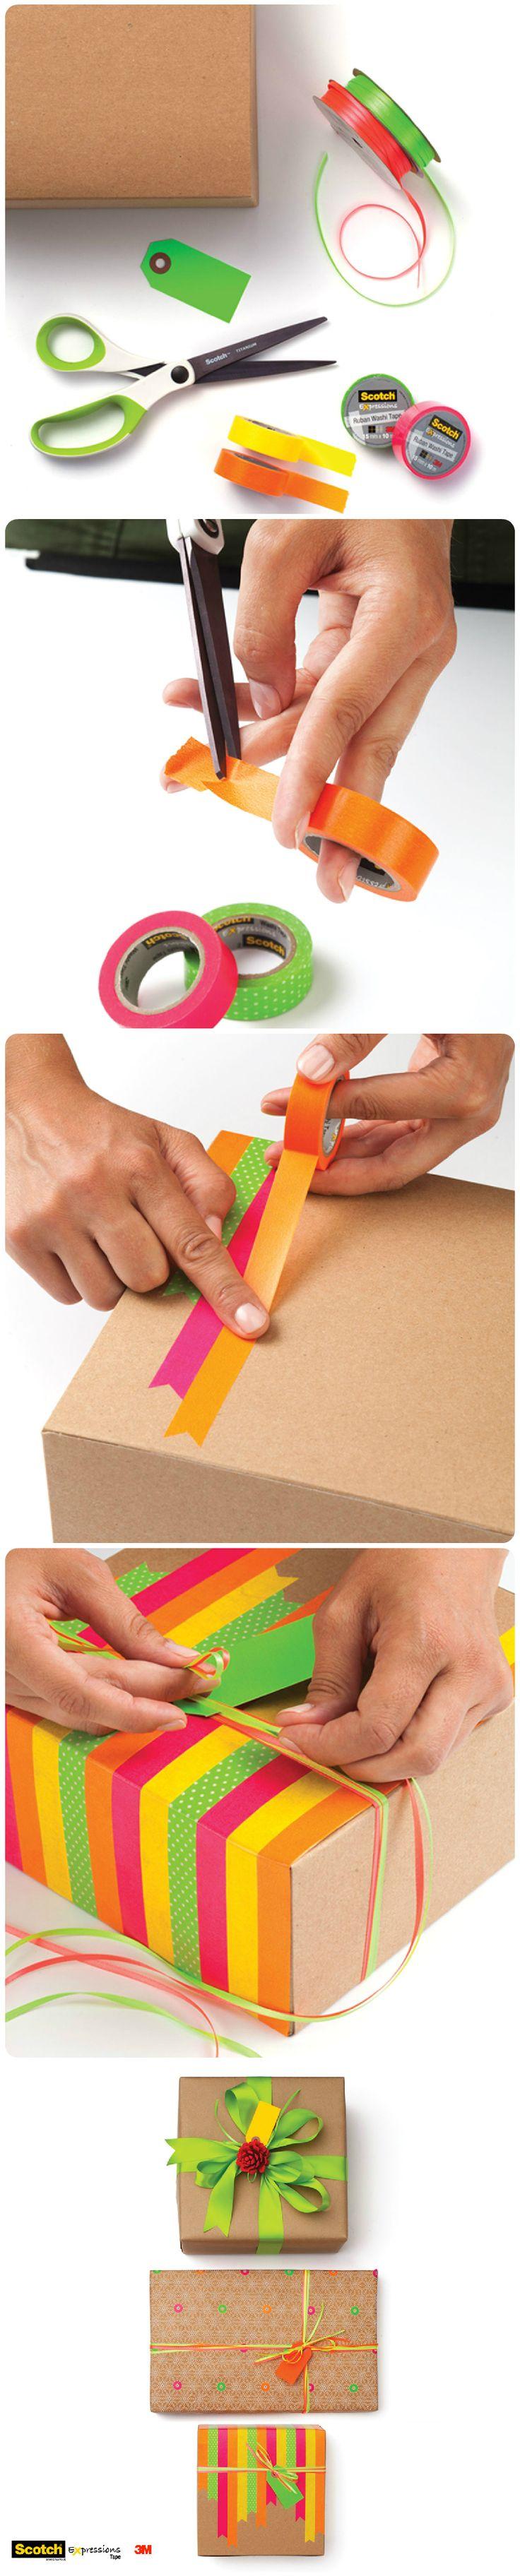 Kraft Paper and neon tape,